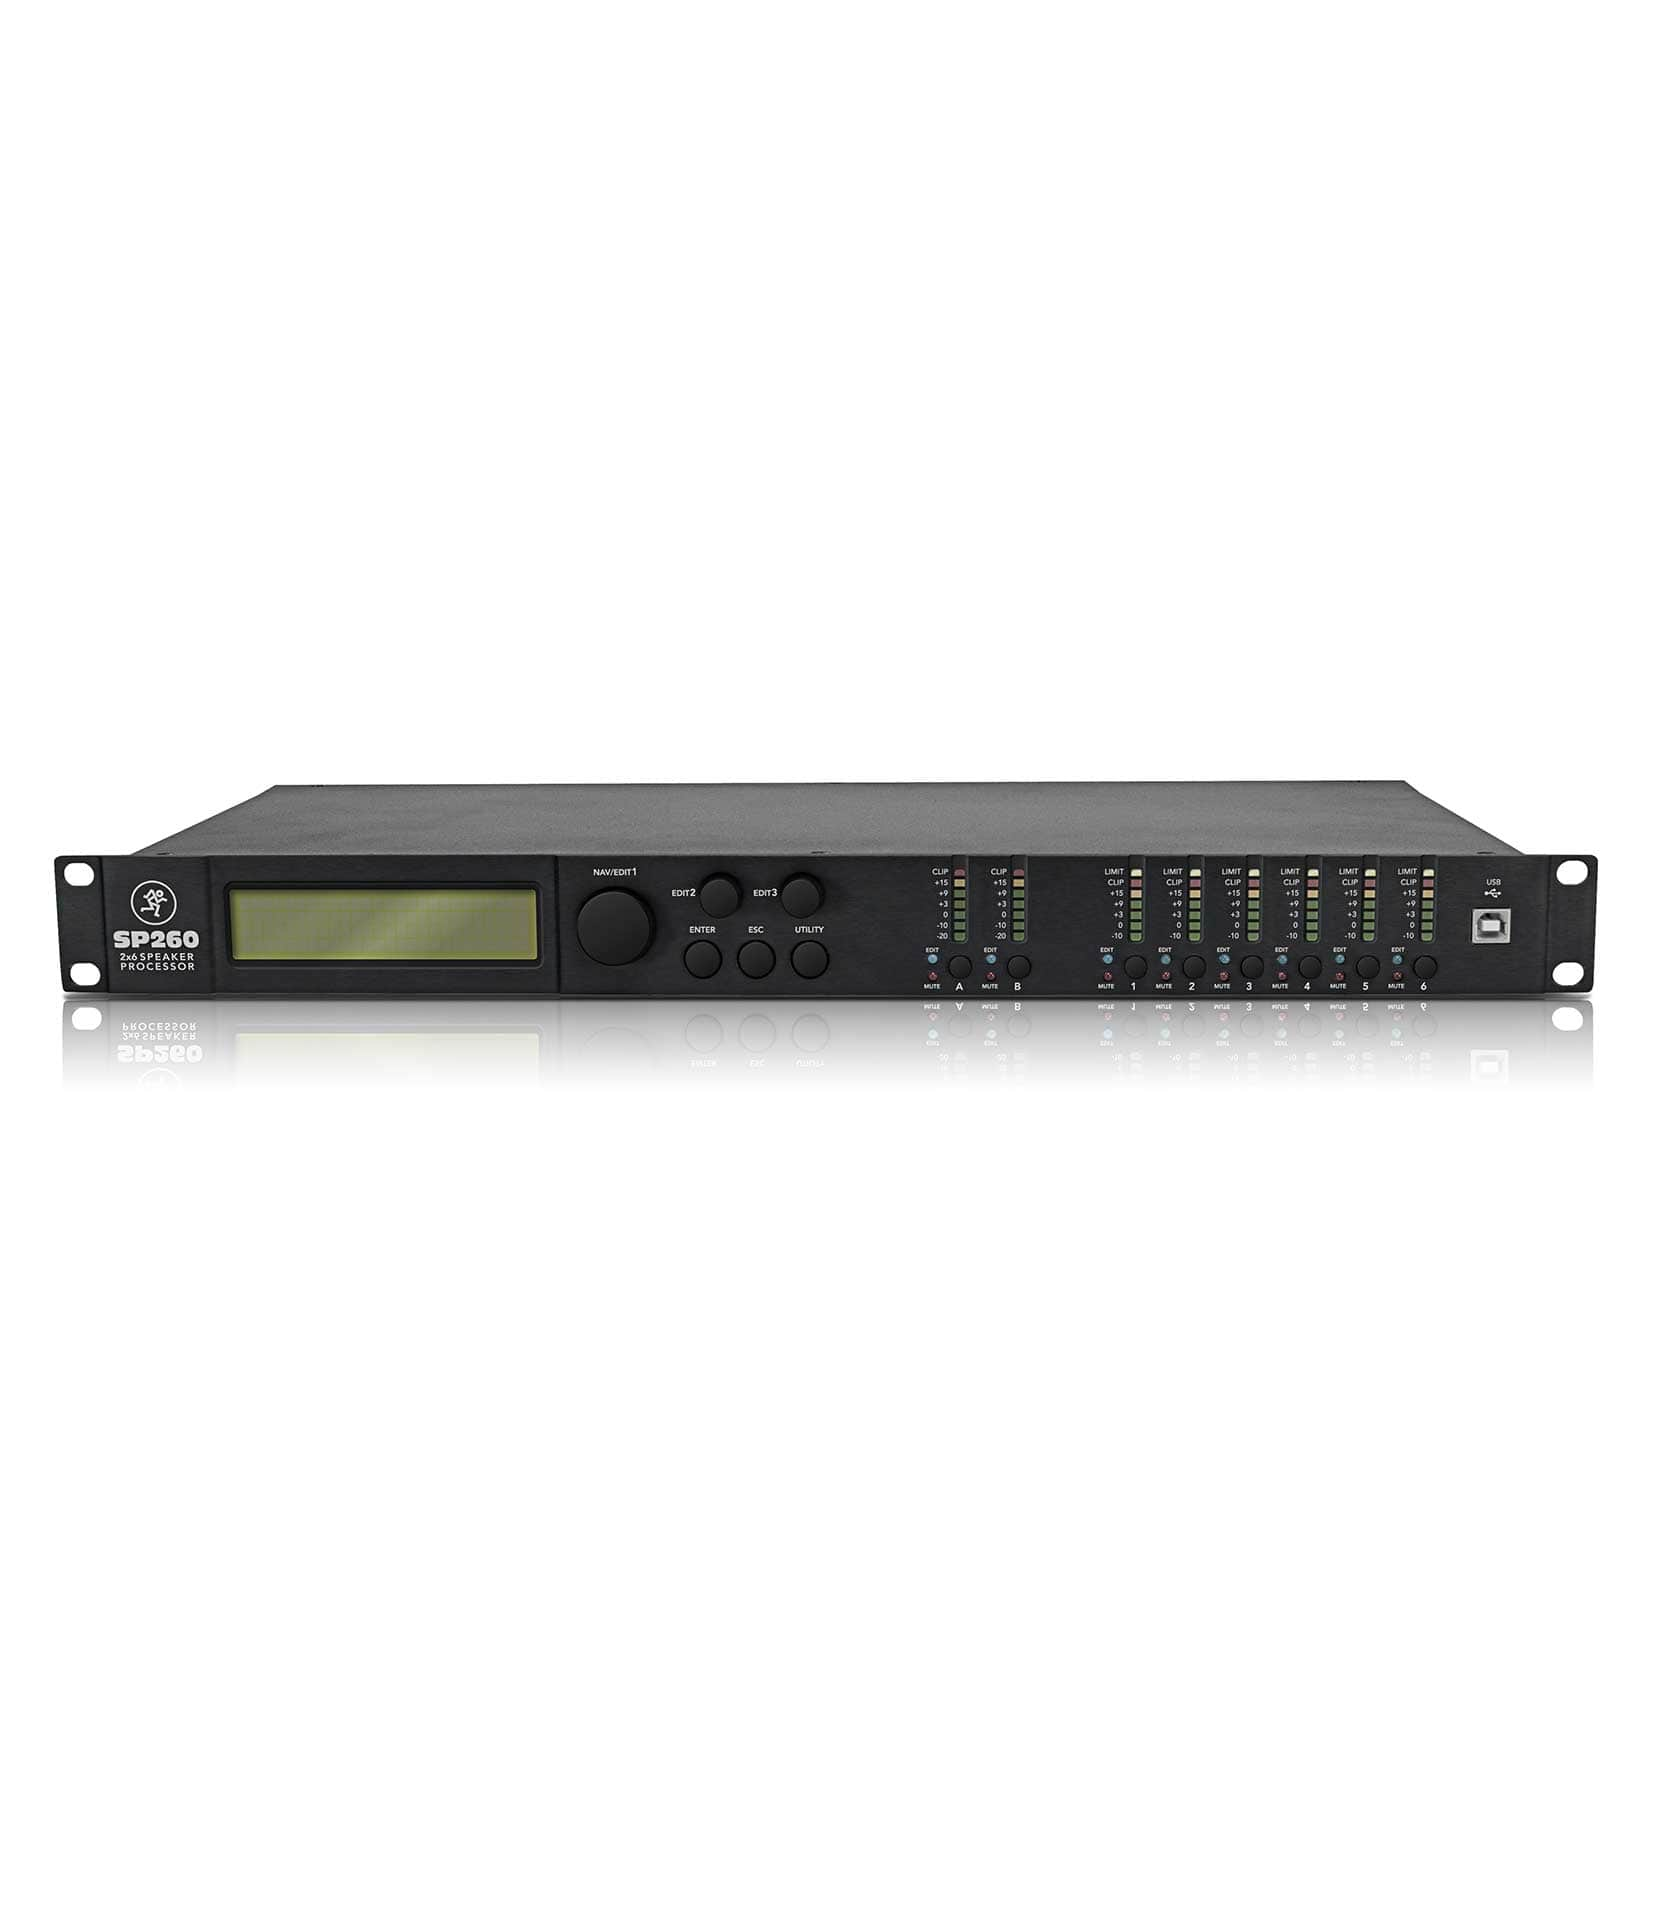 SP260 2x6 Loudspeaker System Processor